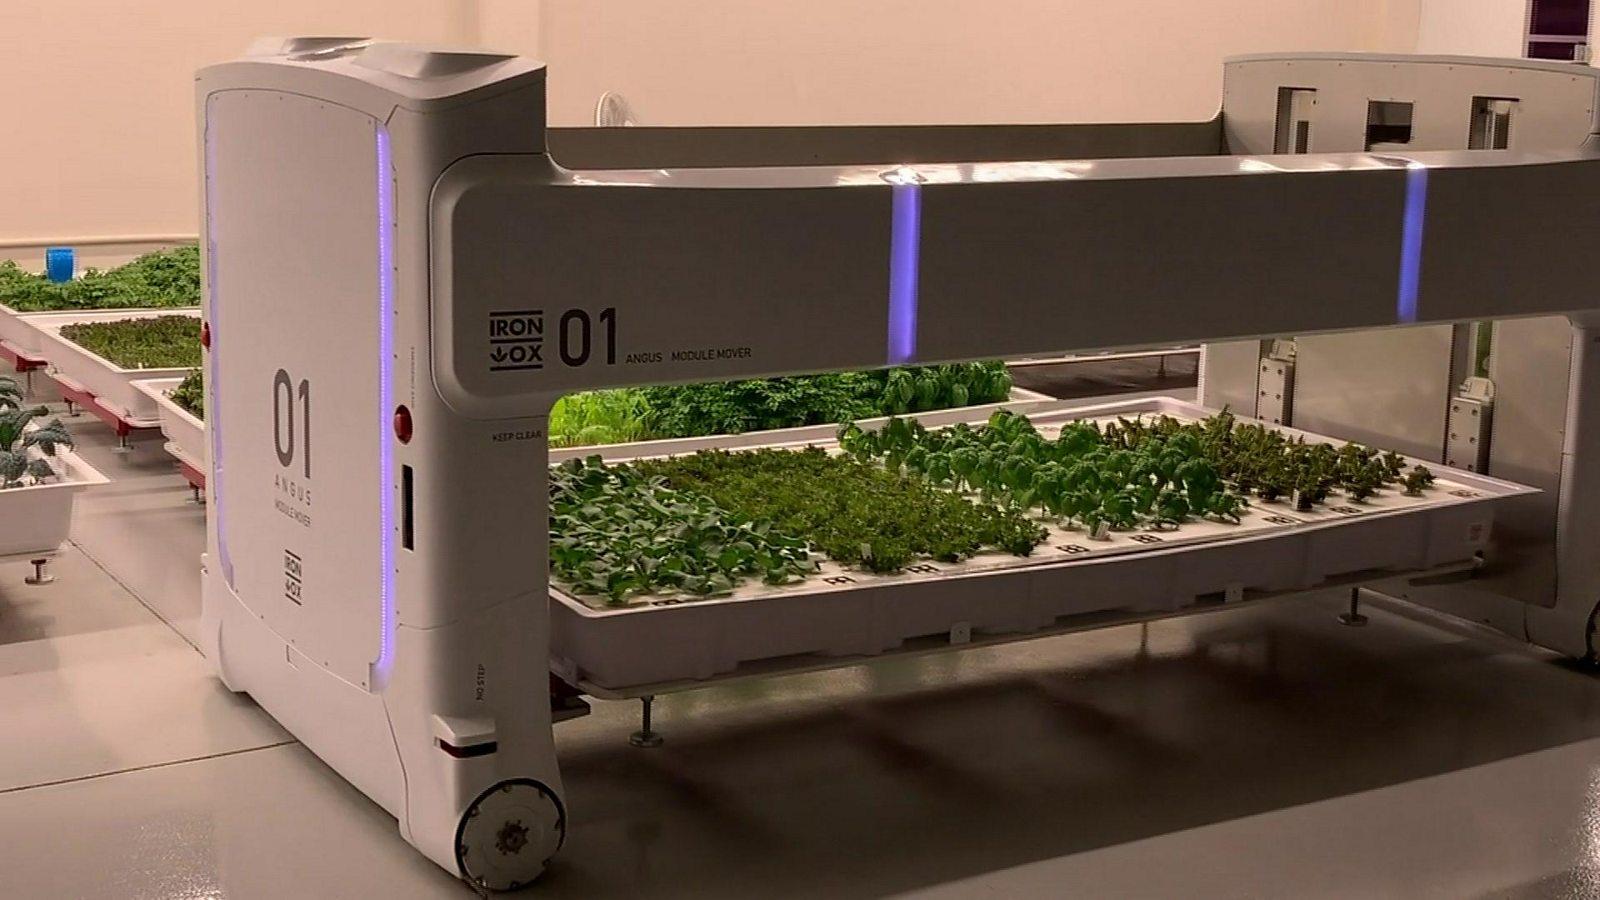 The indoor leafy veg farm that runs itself